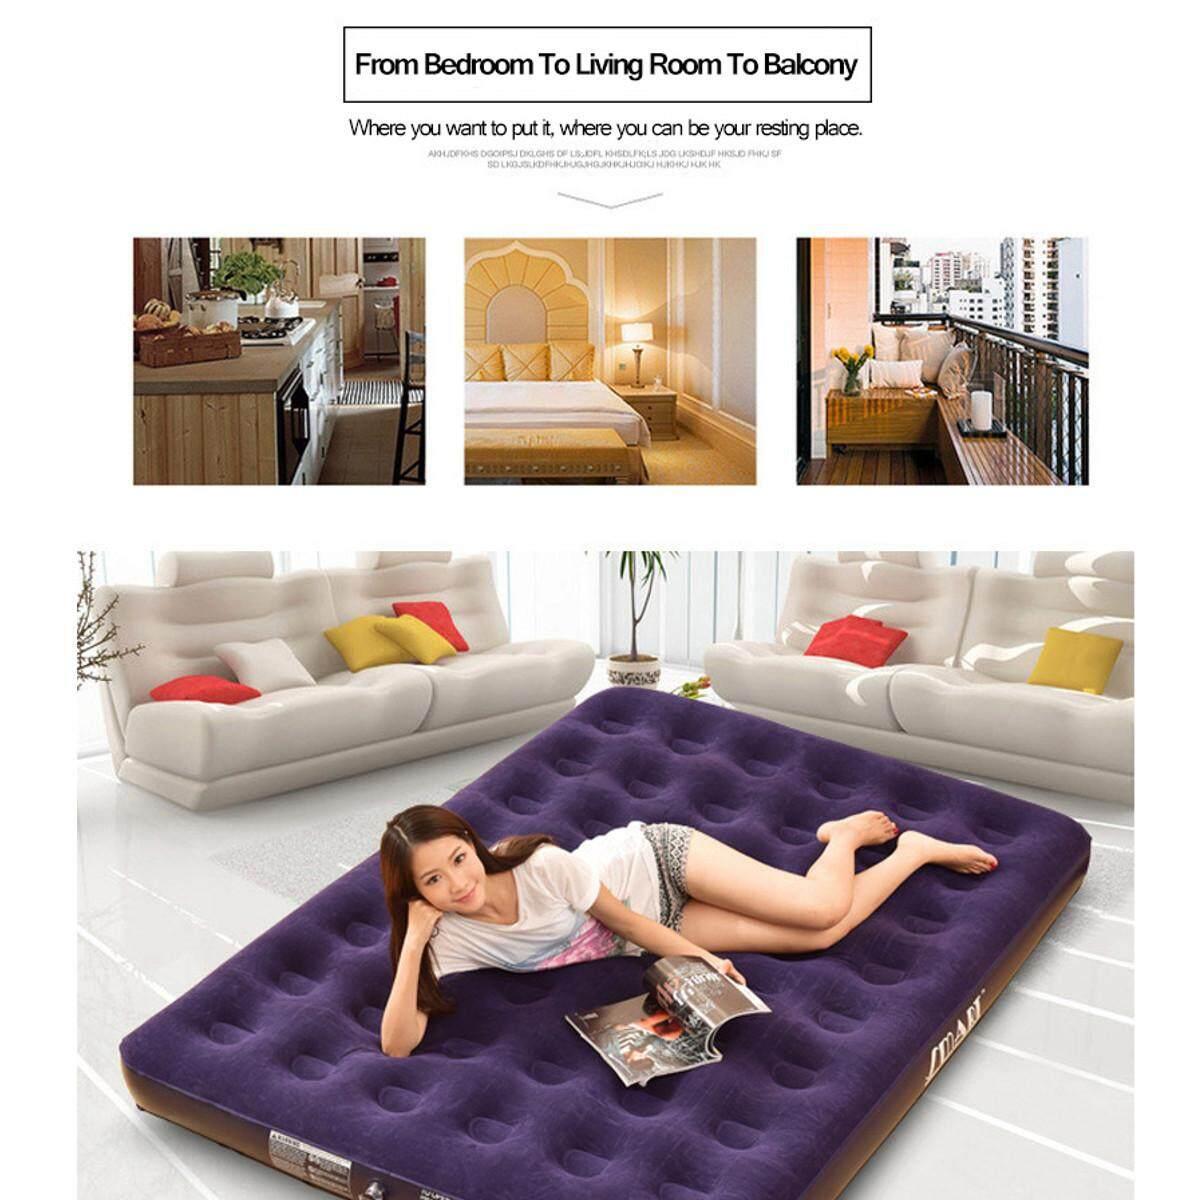 Daftar Harga Sofa Bed Custom November 2018 Terkini Hillary Minimalis Unik Rumah Hotel Modern L Bantal Mobil Dapat Diisi Angin Aksesoris Tempat Tidur Kreatif Luar Ruangan Lazy Udara